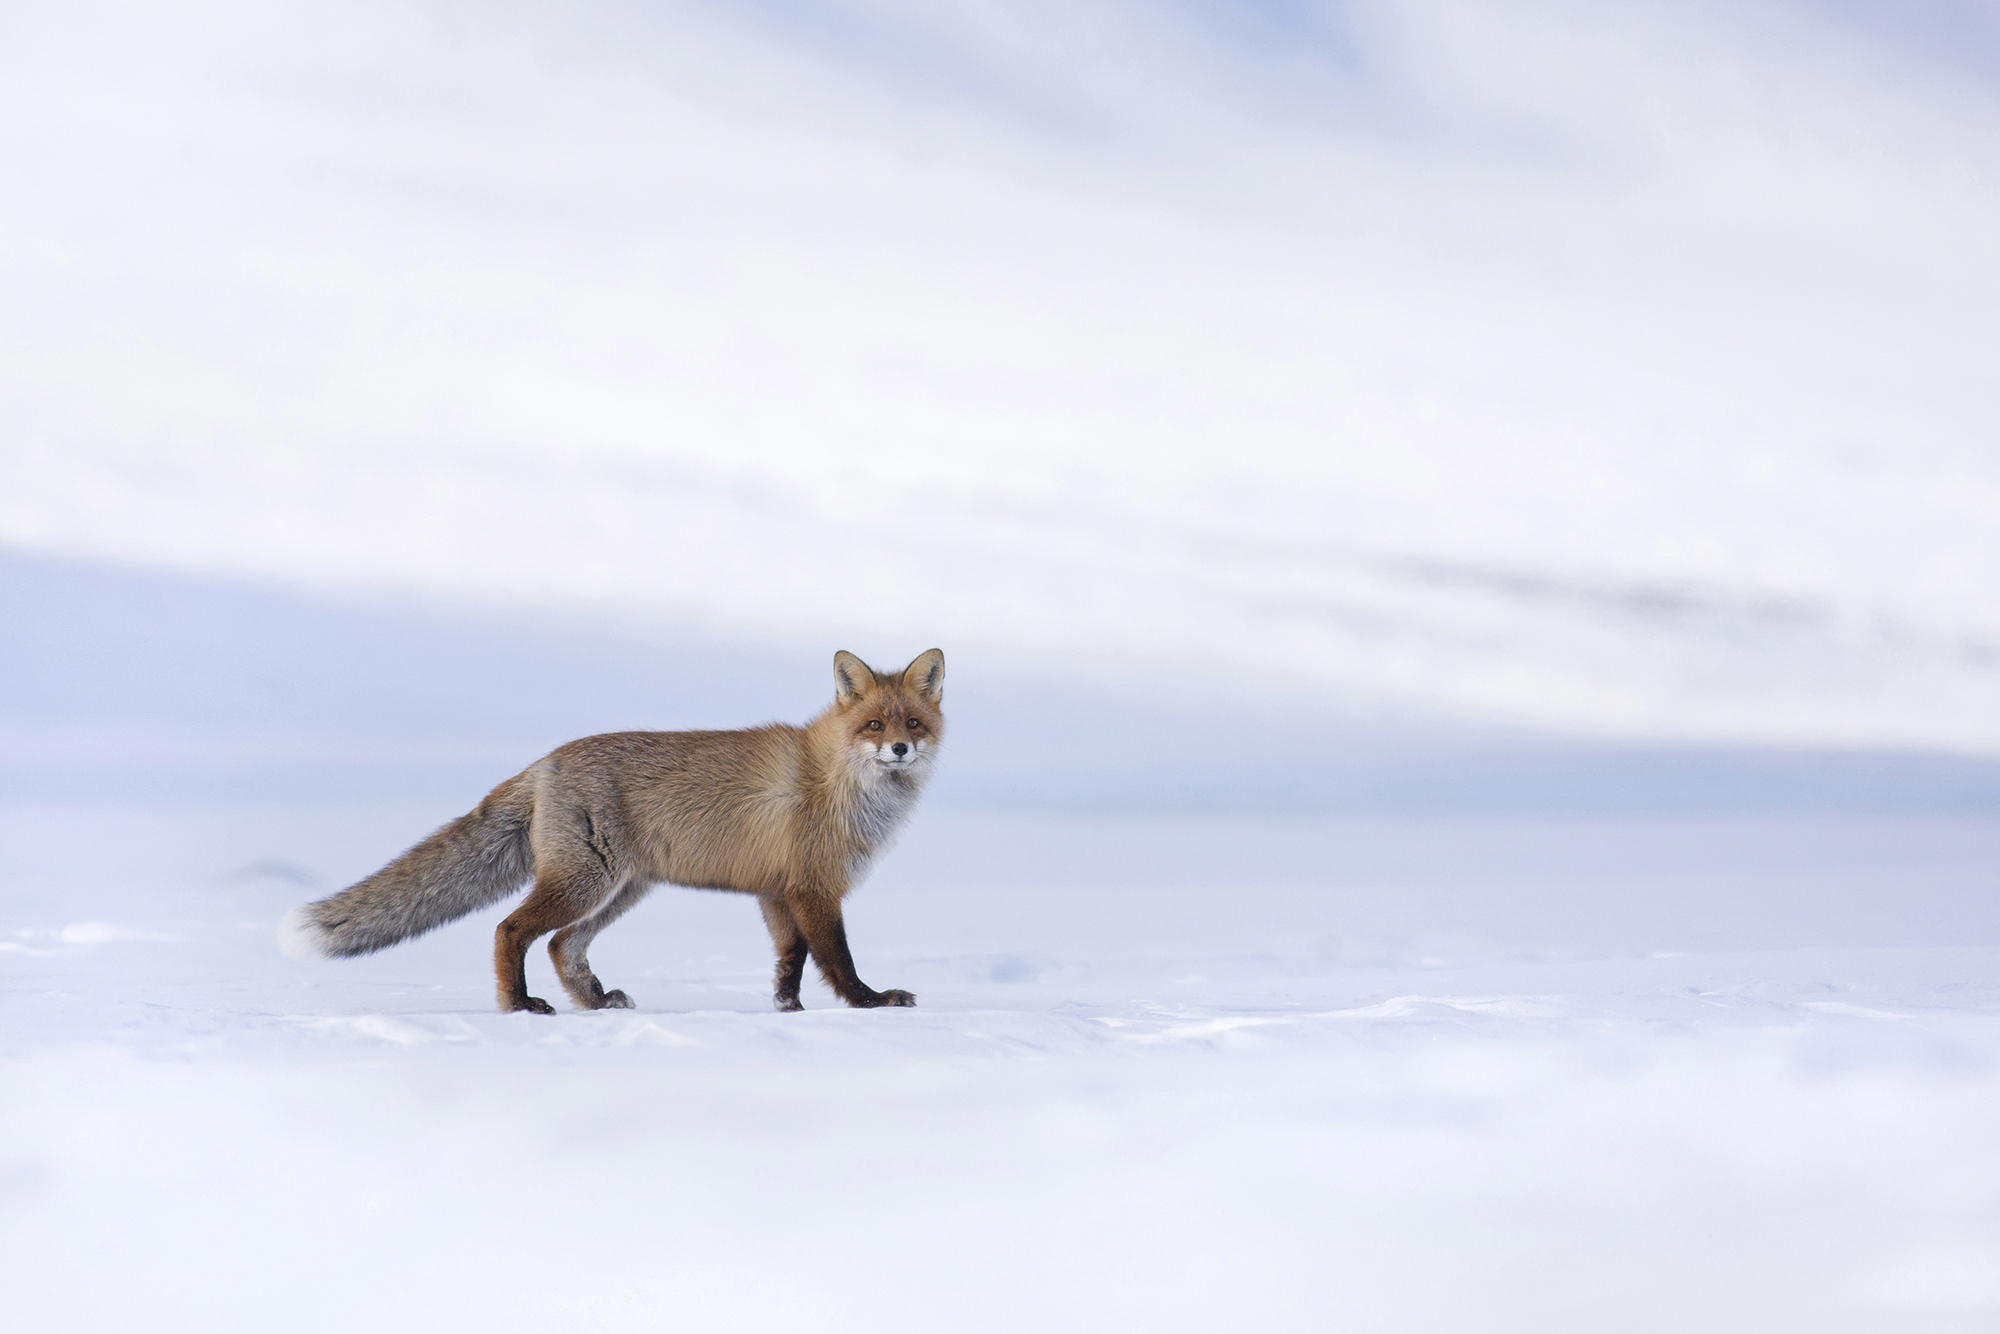 RSRed_fox_0T2A7348.jpg